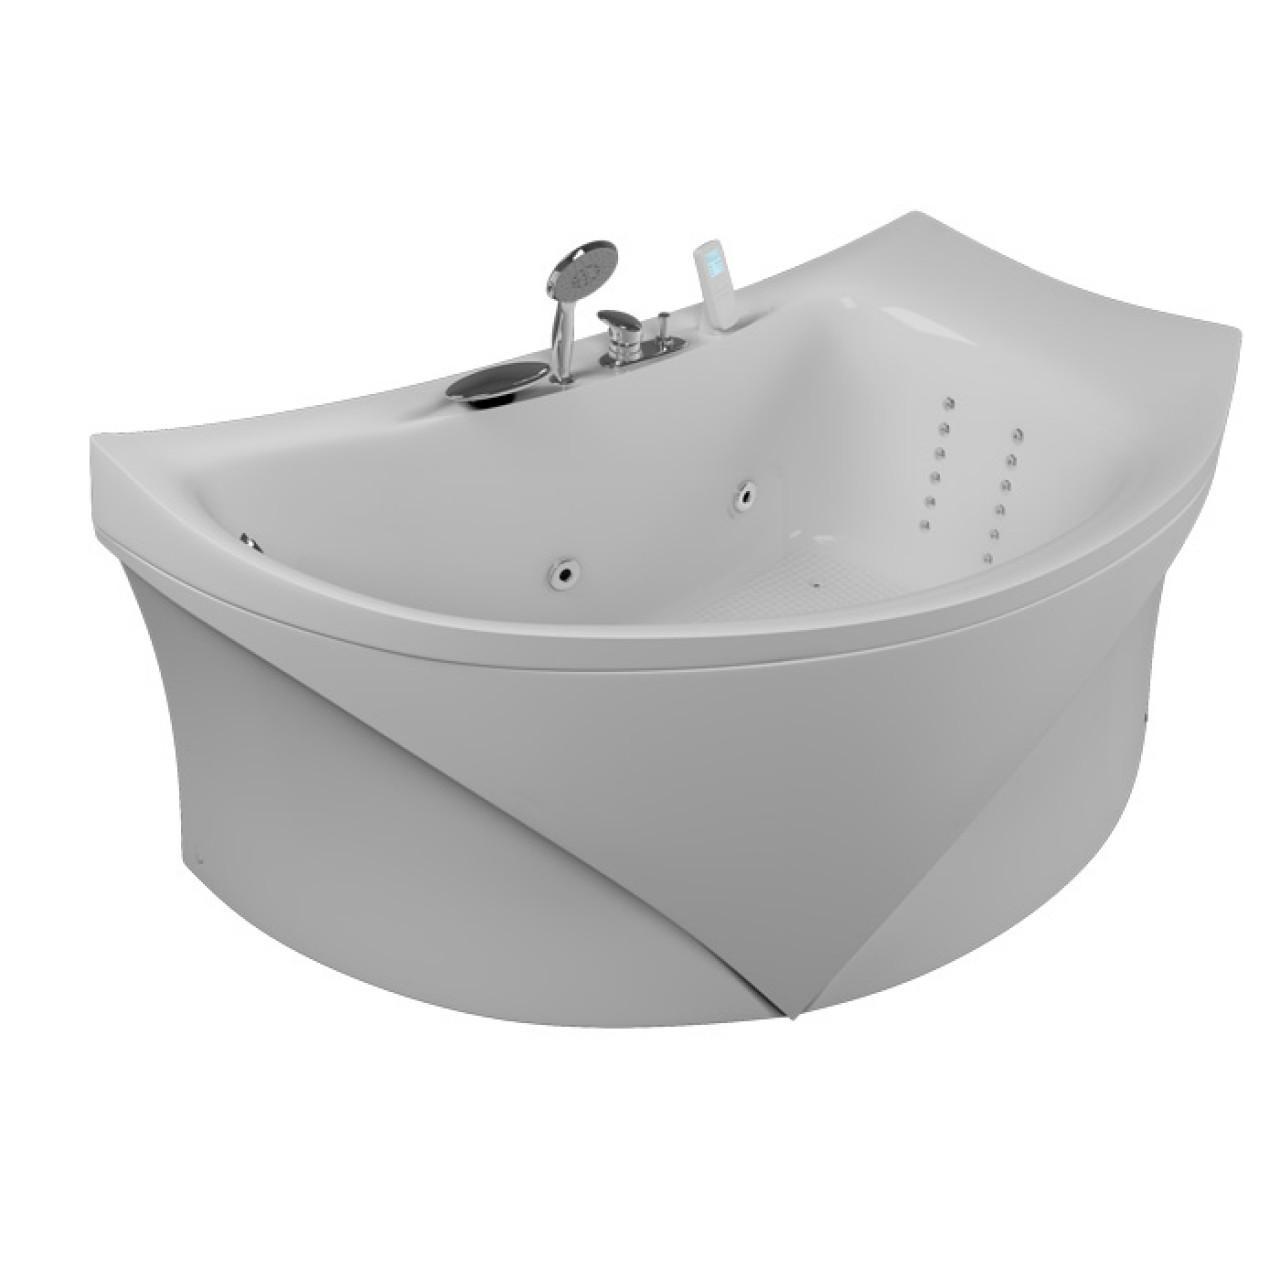 Акриловая ванна Акватика Готика Basic 150x90x65 купить в Москве по цене от 47460р. в интернет-магазине mebel-v-vannu.ru